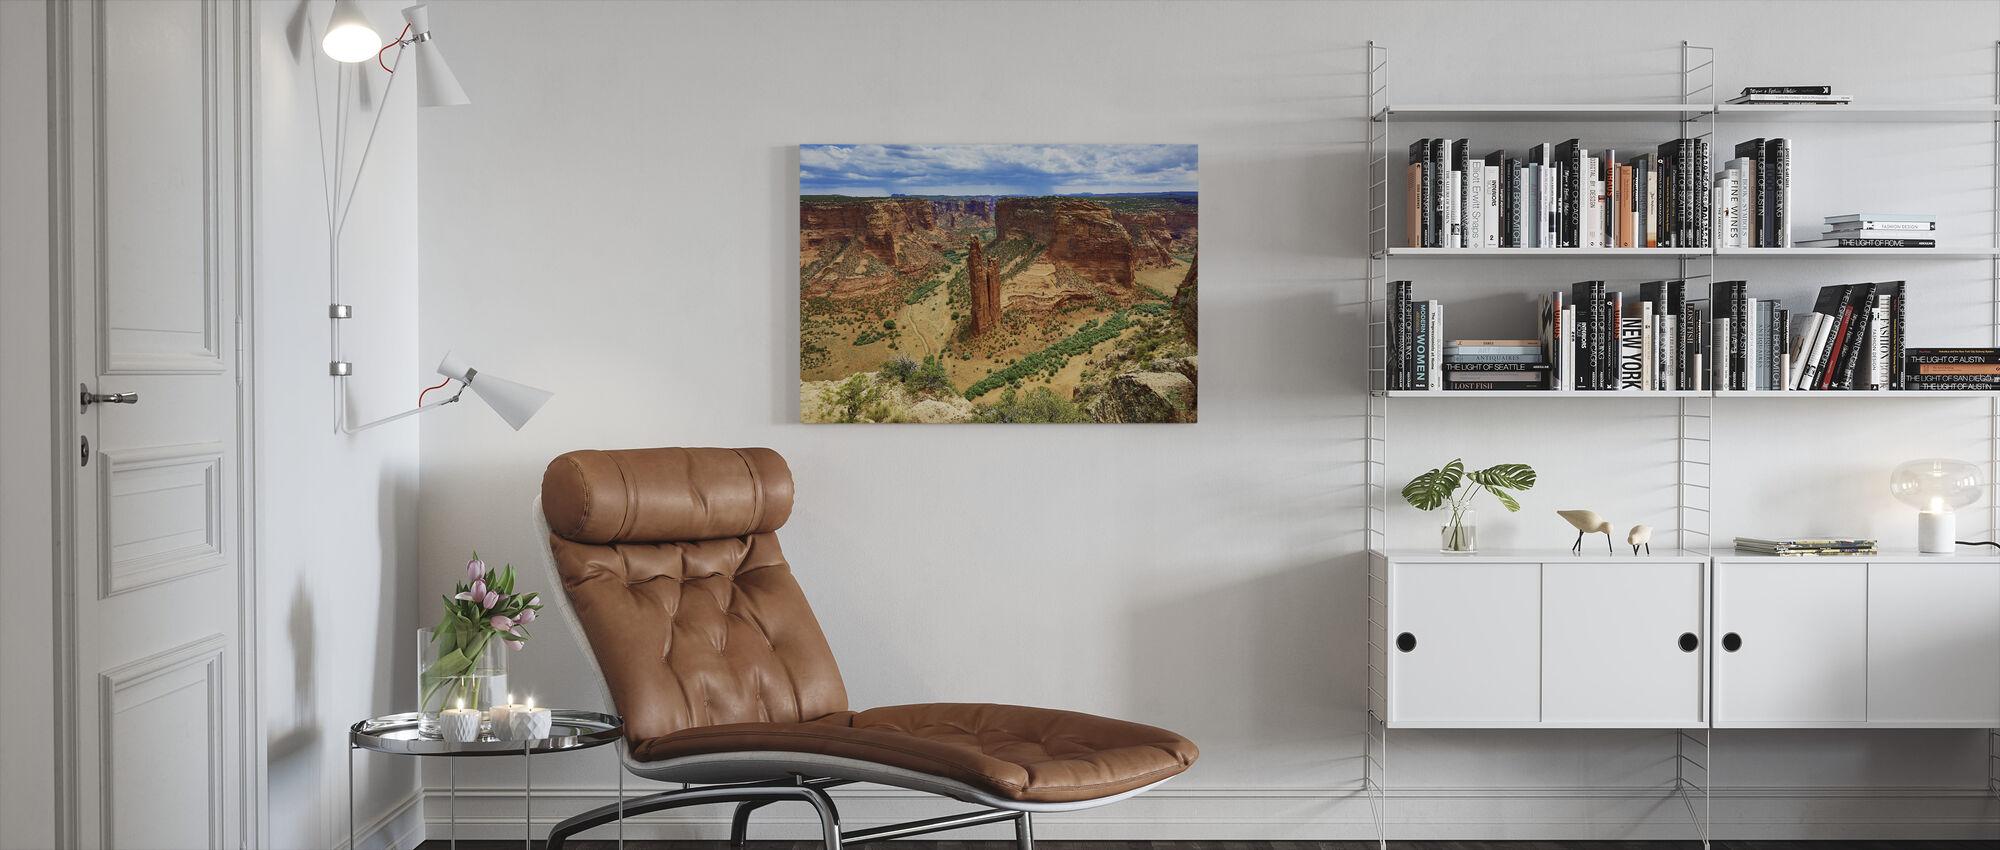 De Chelly Zandsteen - Canvas print - Woonkamer